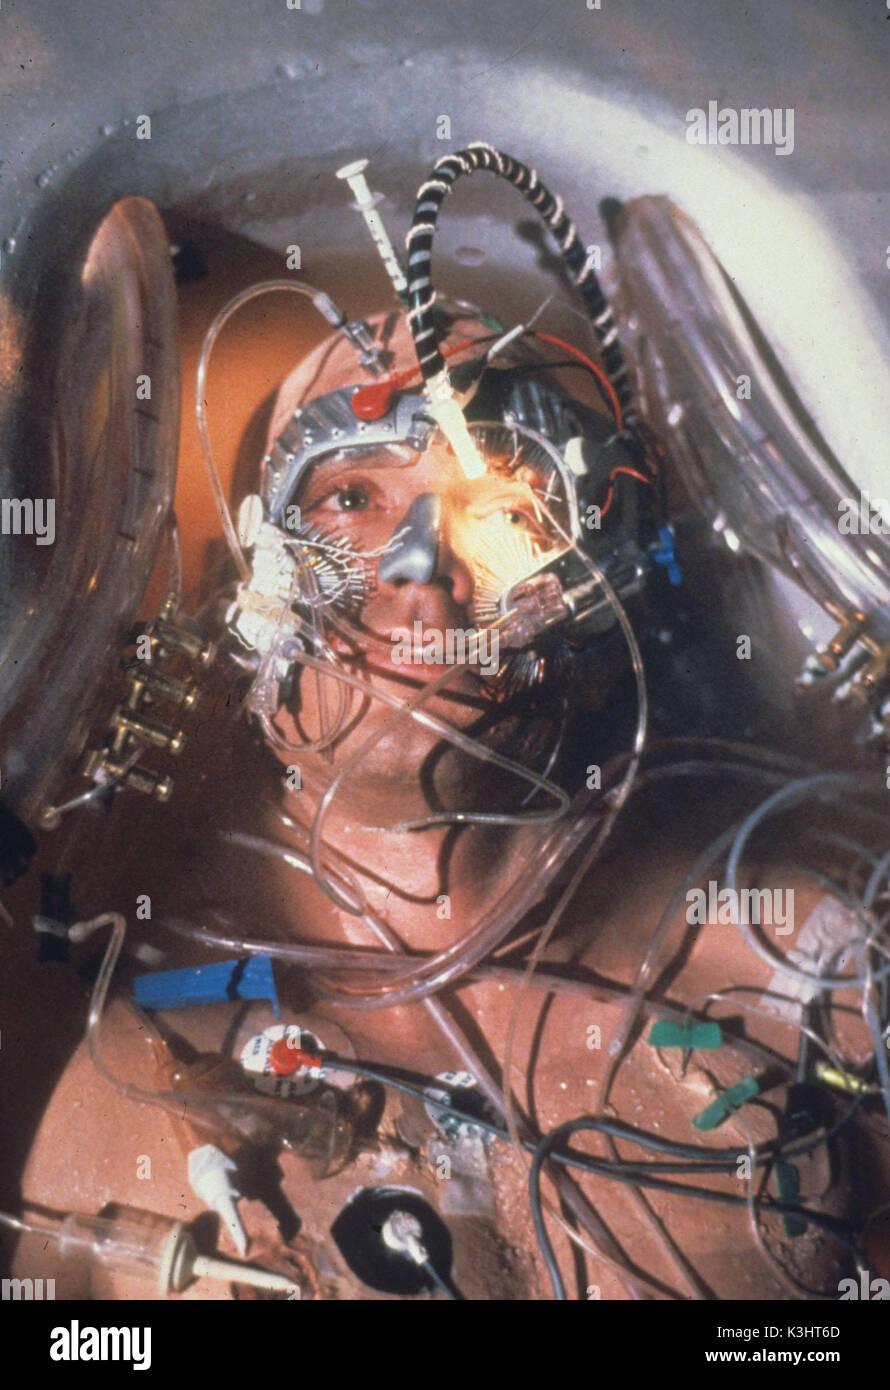 TIMEBOMB MICHAEL BIEHN     Date: 1991 - Stock Image